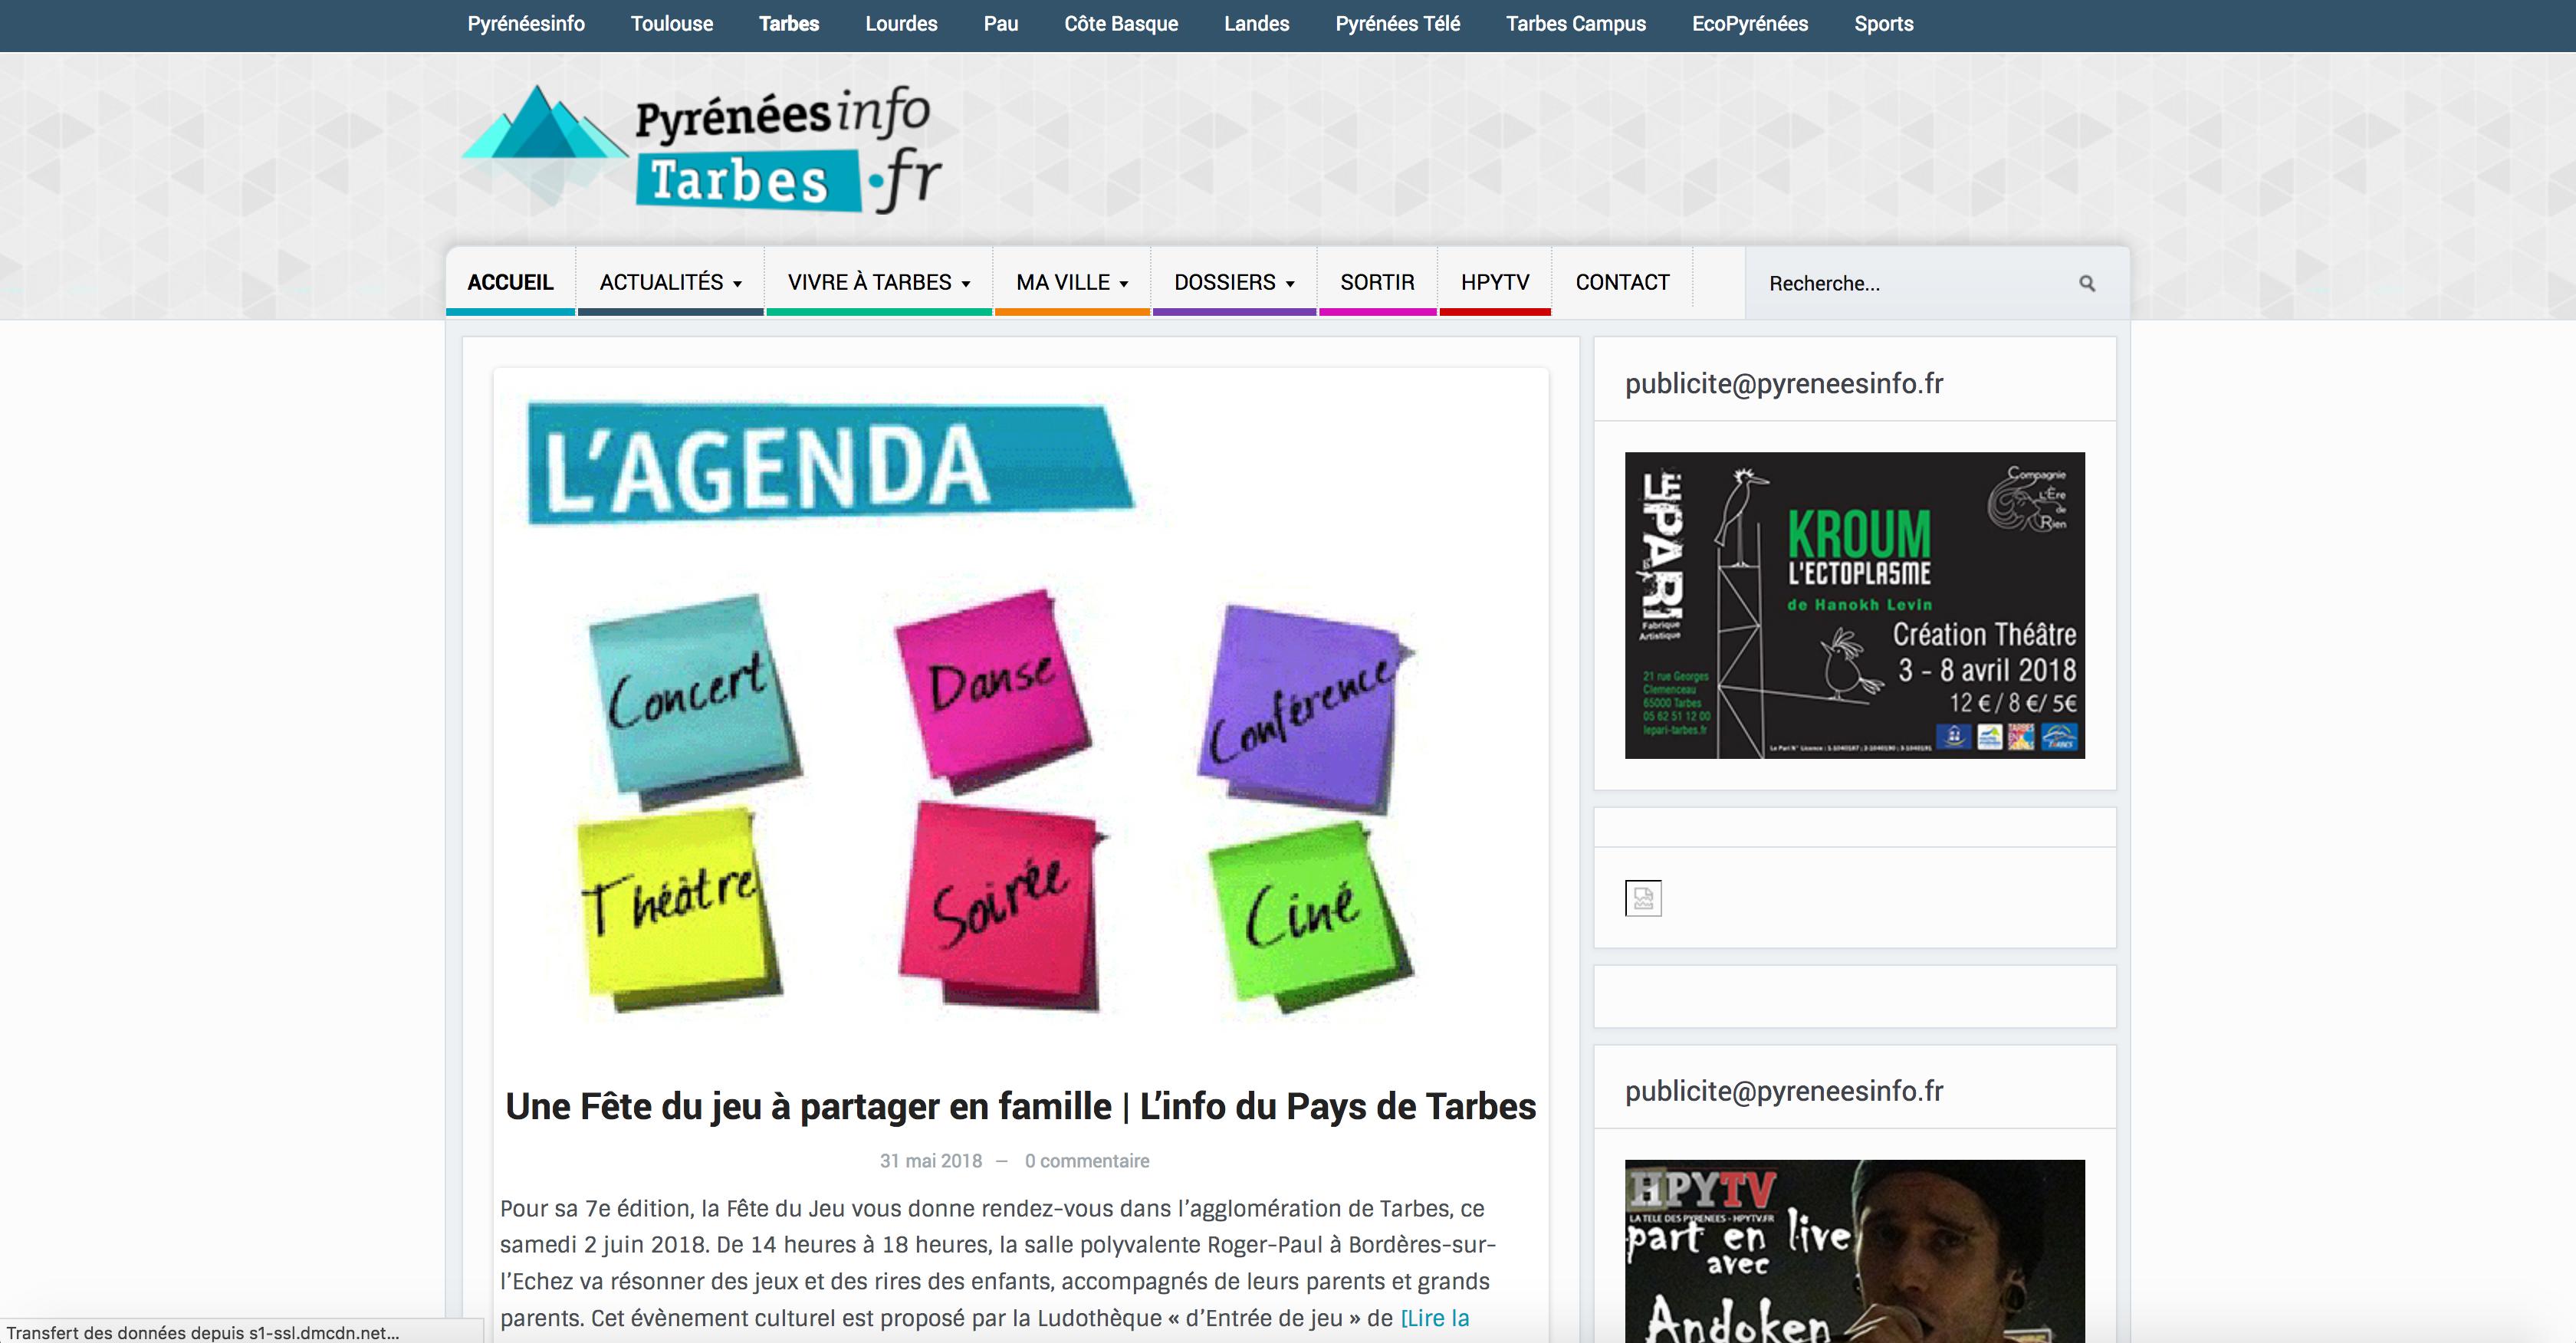 Page d'accueil Pyrénées Info Tarbes